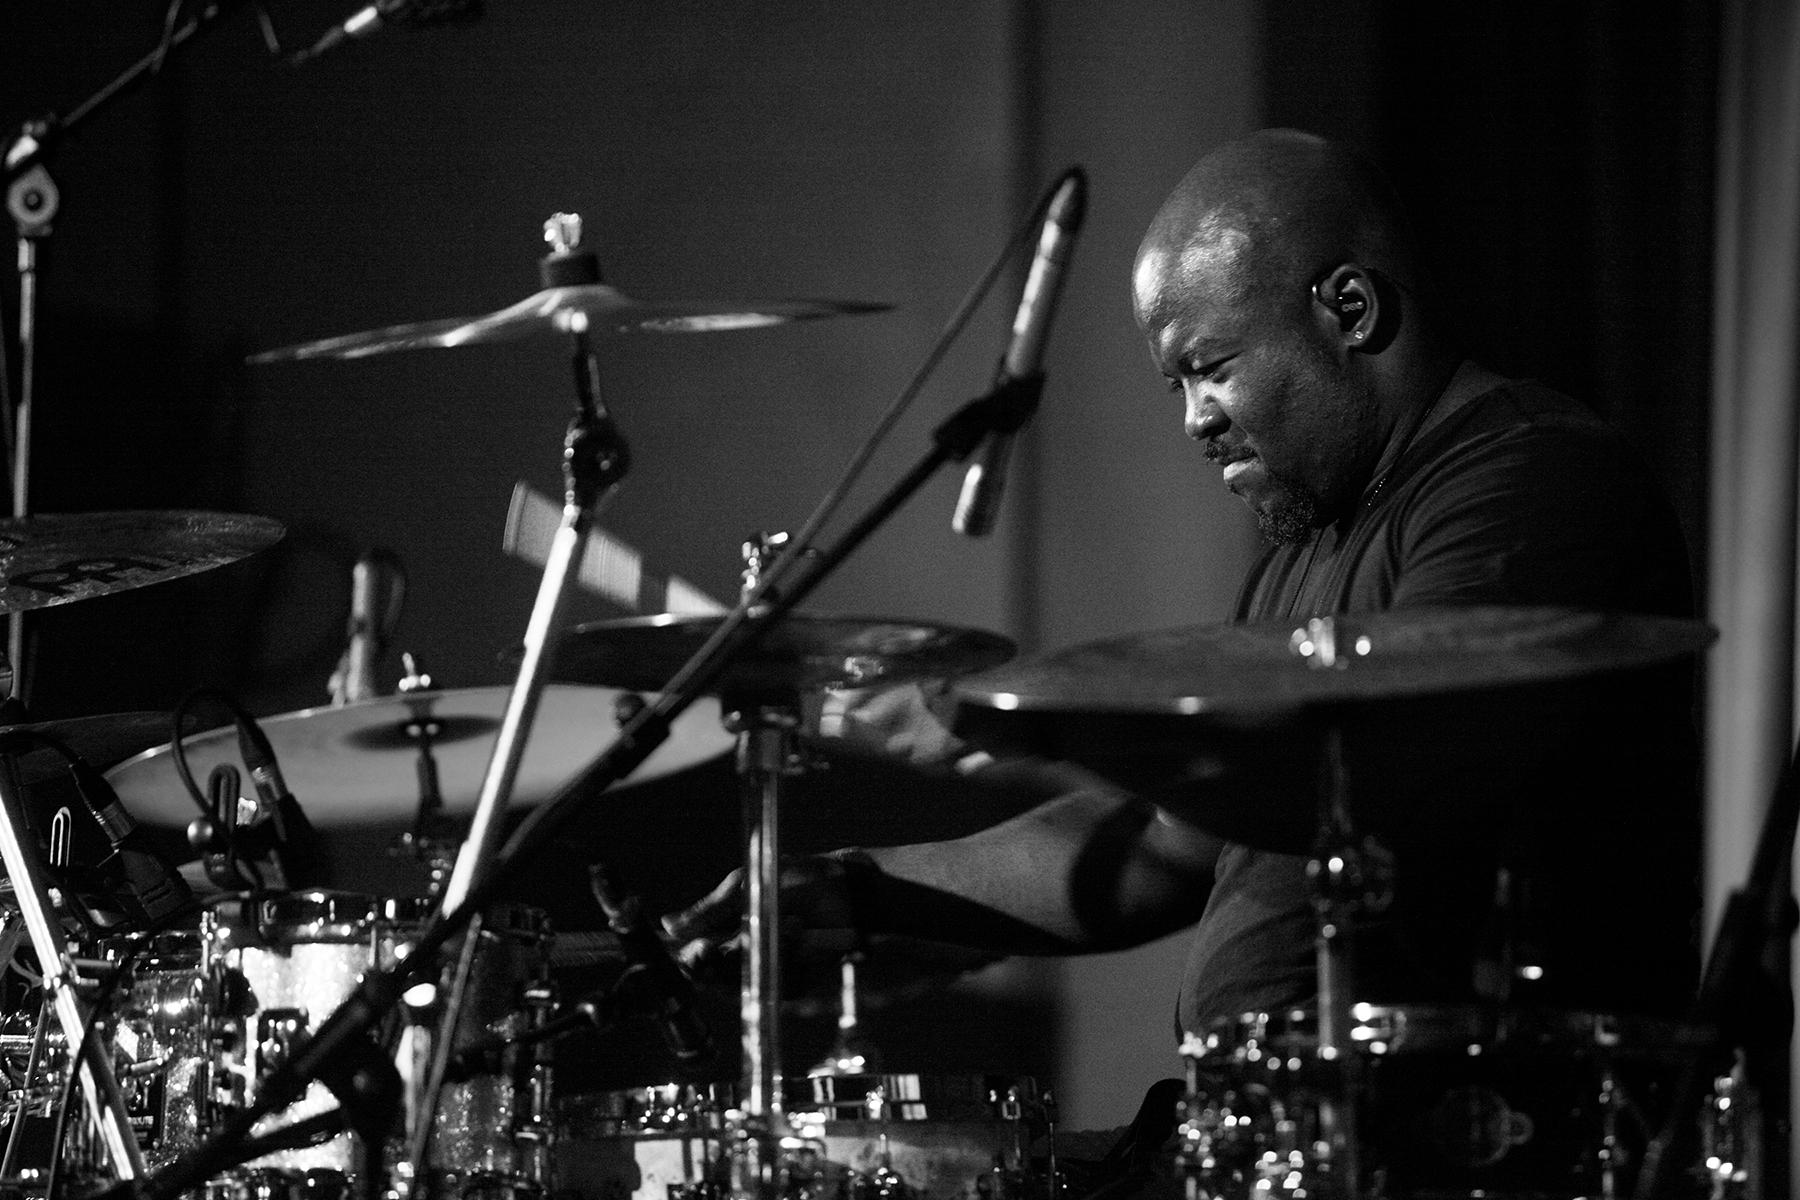 Chris Coleman, American drummer, United Kingdom, 2013. (Photo by Richard Ecclestone/Redferns)